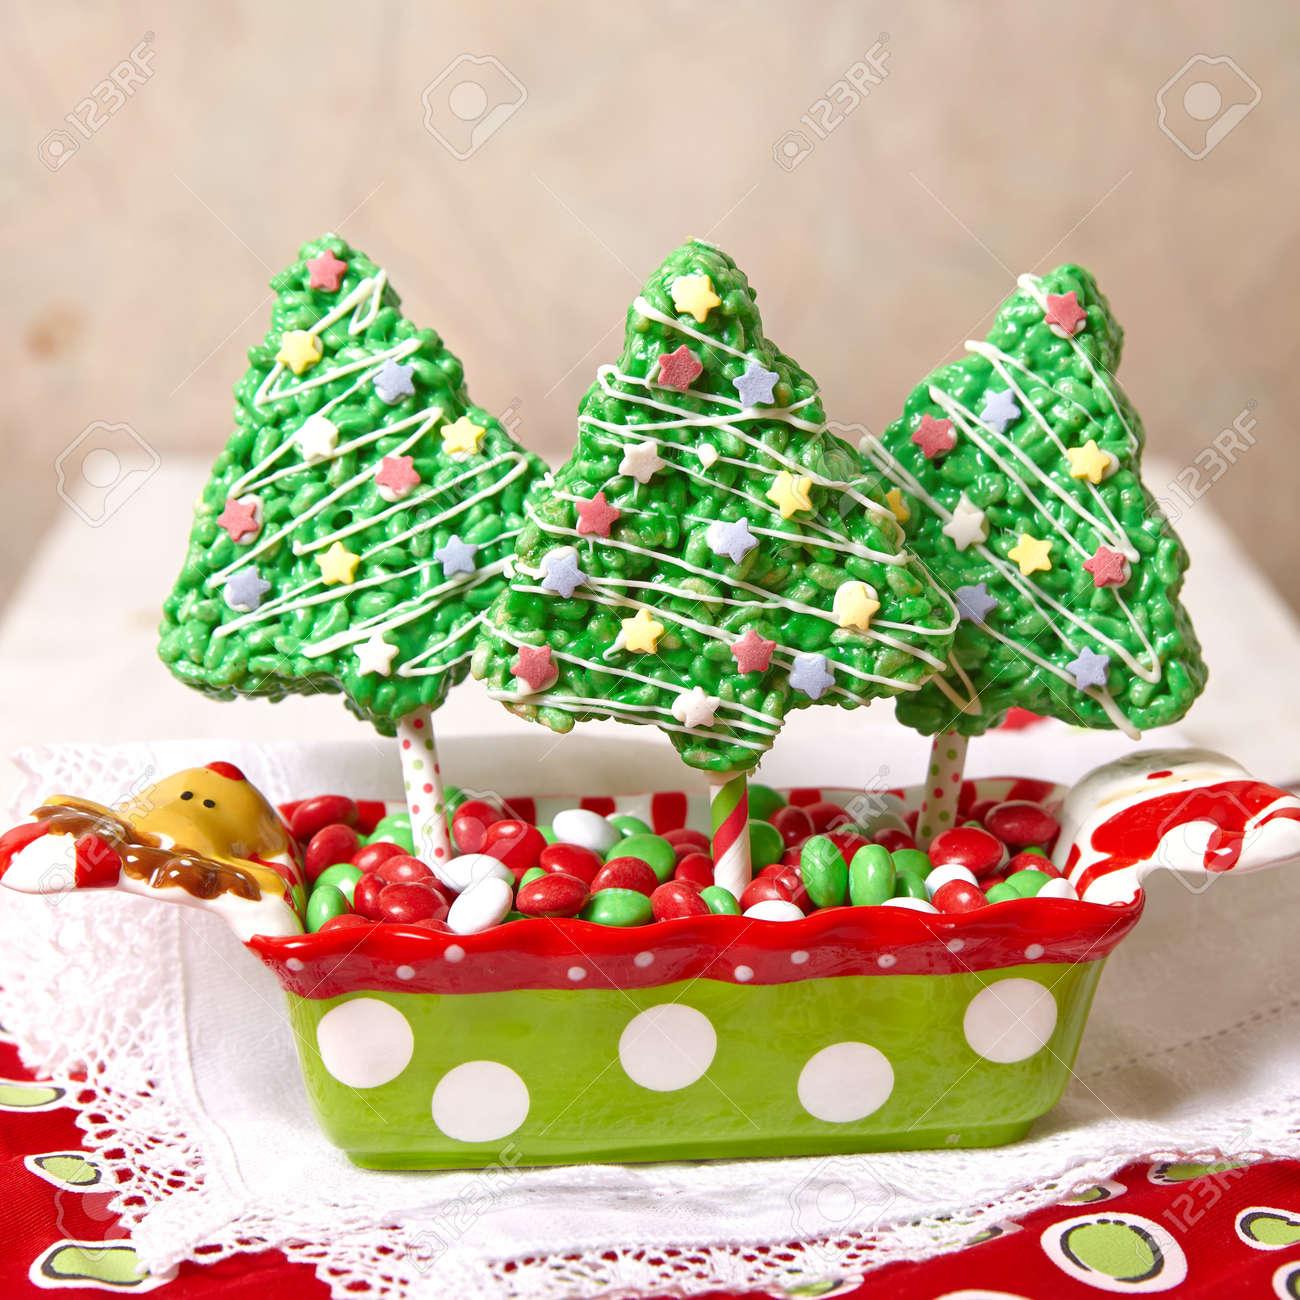 rice crispy bars decorated for a christmas stock photo 44764022 - Christmas Rice